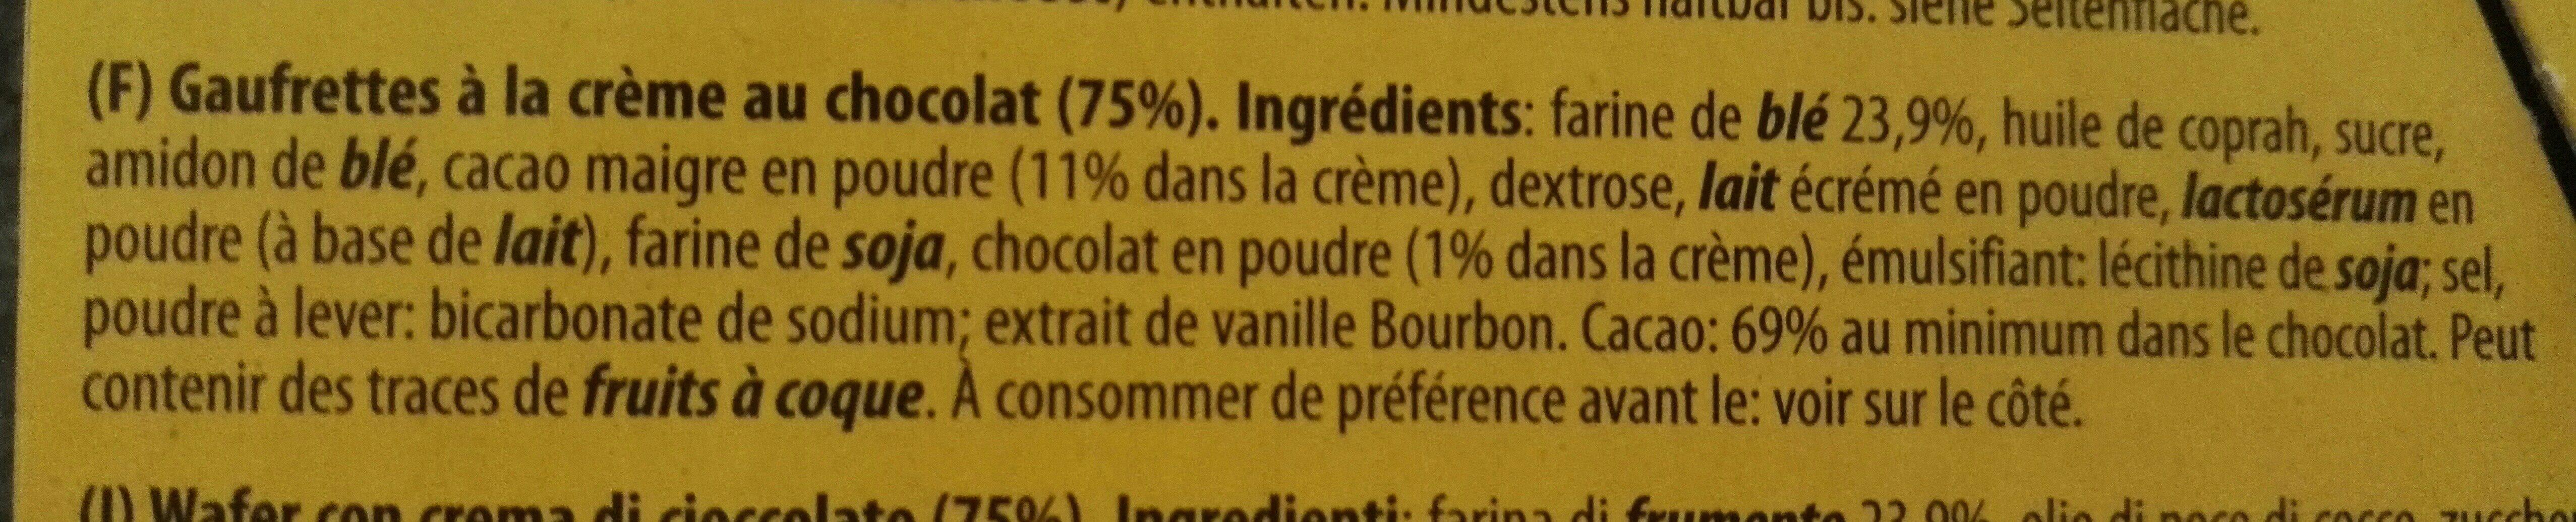 Wafers Choco - Ingrédients